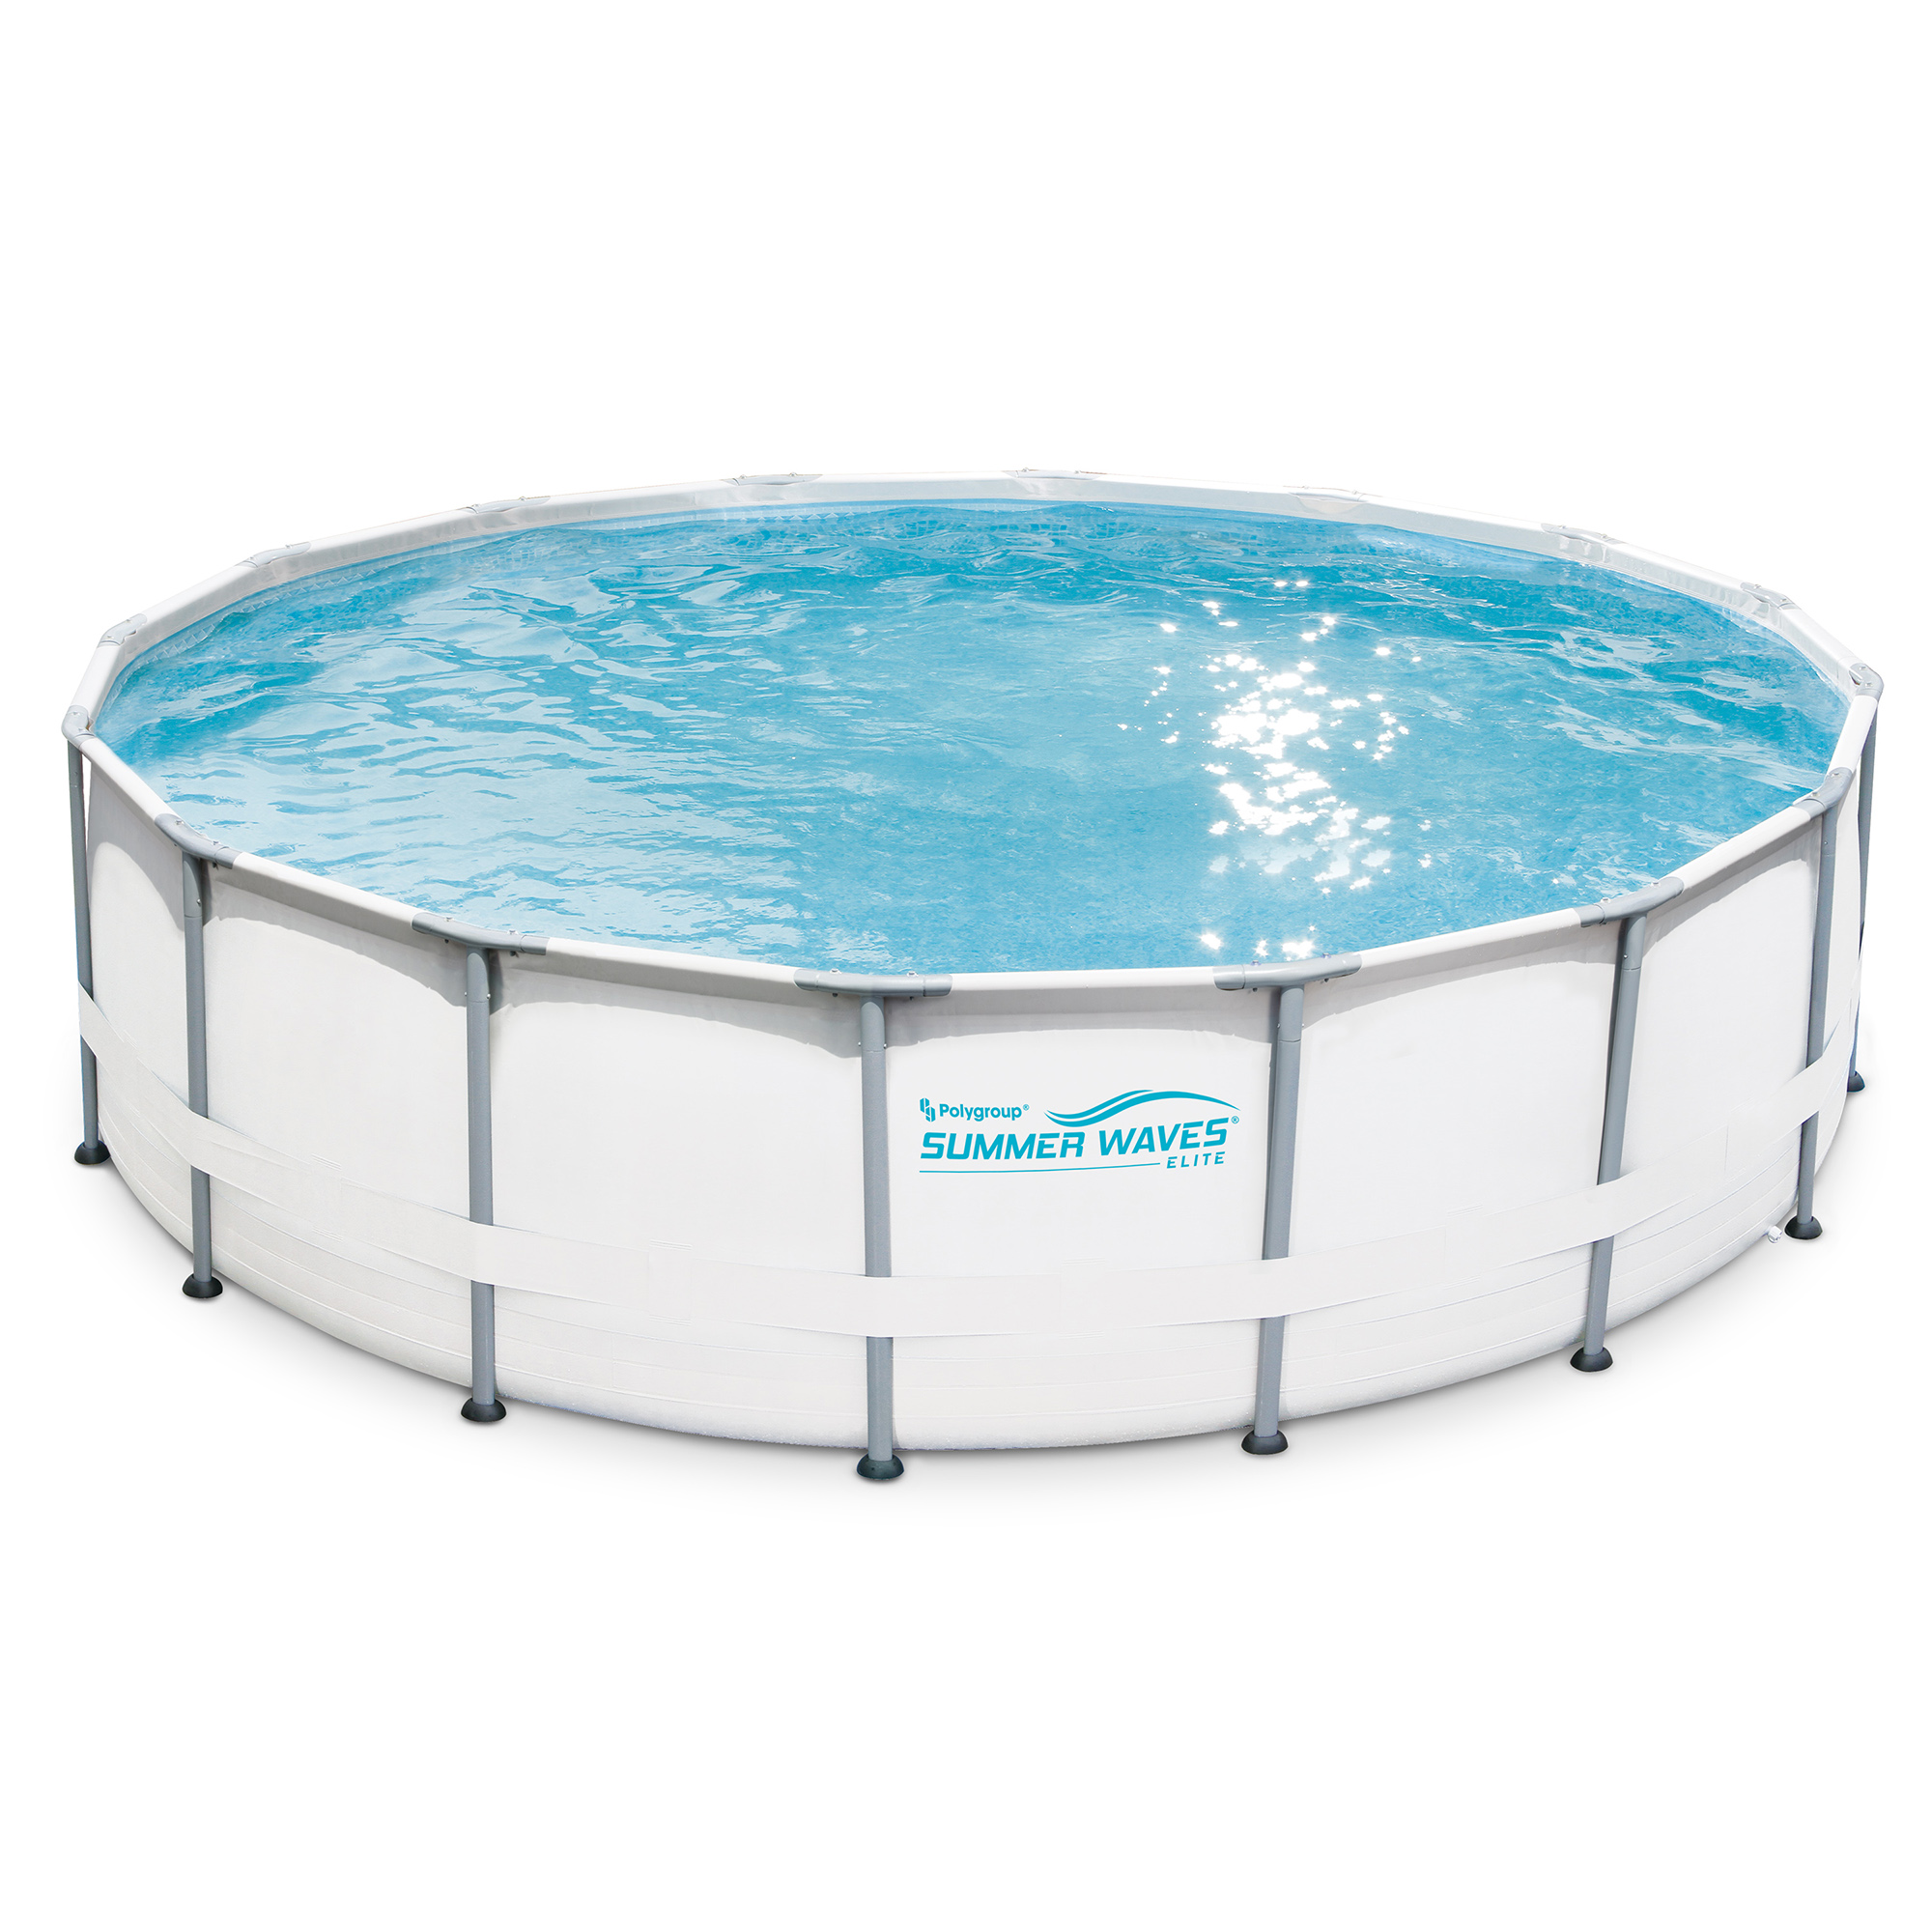 "Summer Waves Elite 16'x48"" Premium Frame Above Ground Swimming Pool"